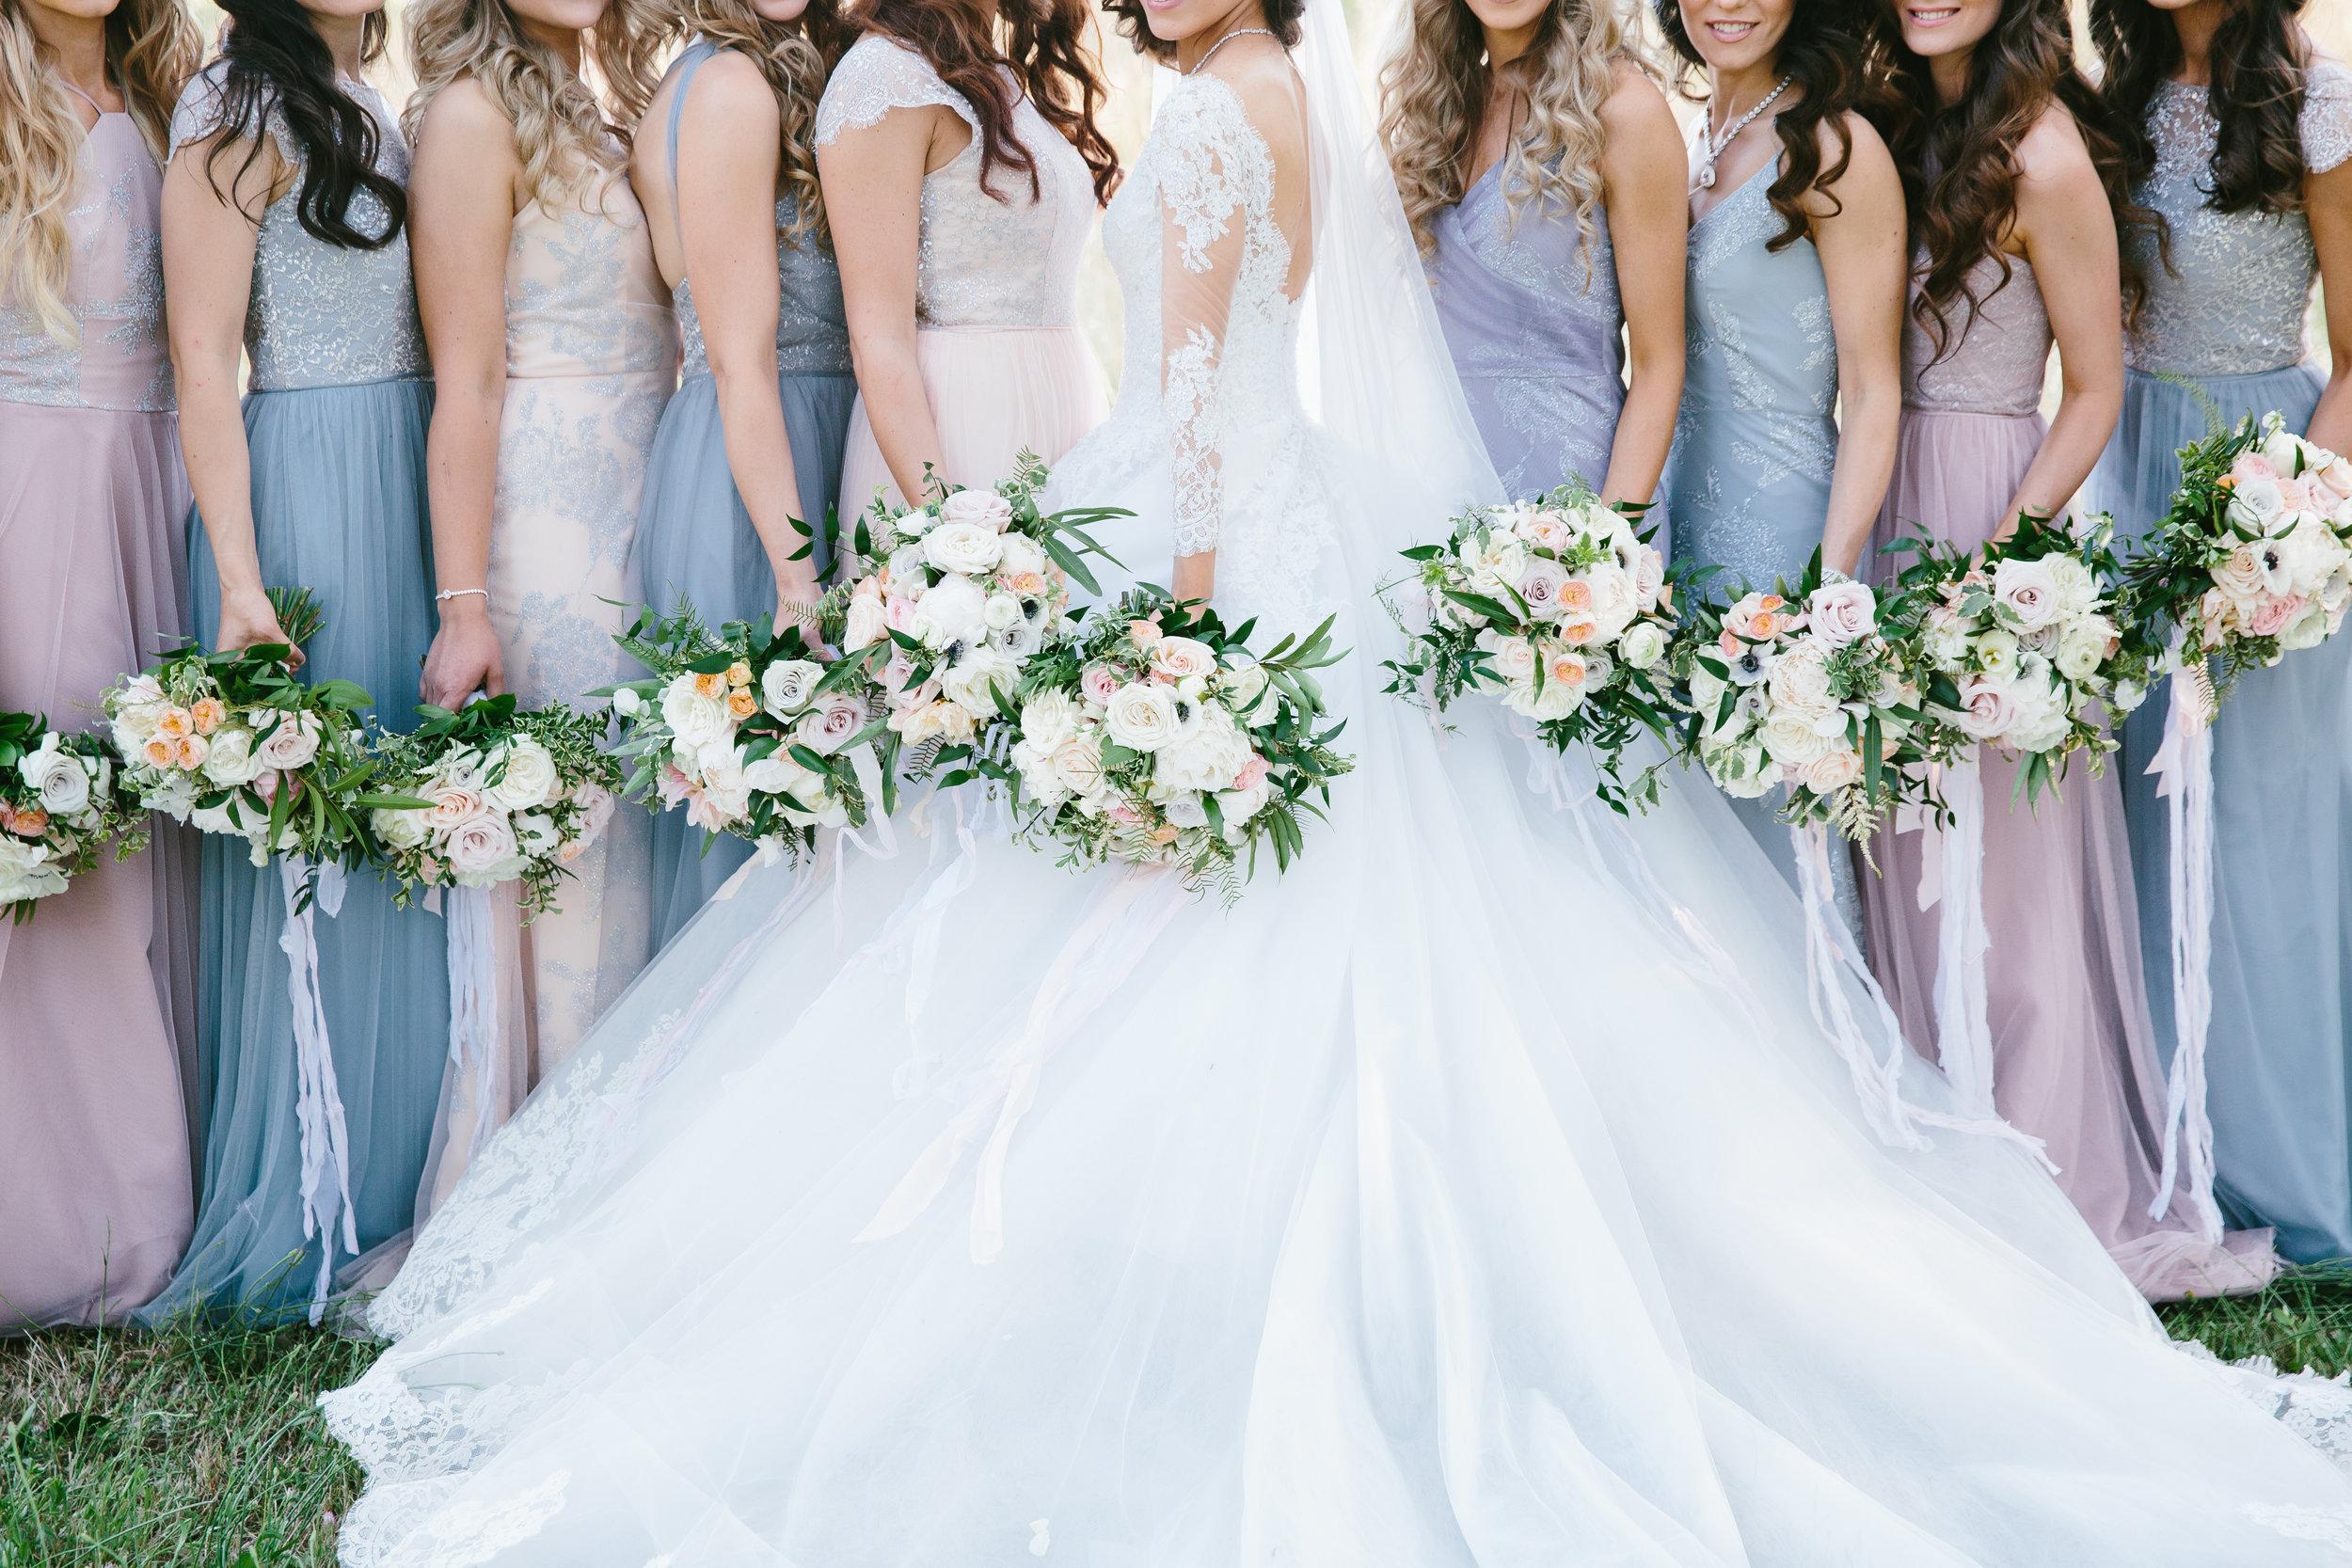 Violette-fleurs-event-design-roseville-anna-perevertaylo-rancho-robles-vinyards-Wedding-design-Curated-Bliss-Sacramento-bouquets.jpg